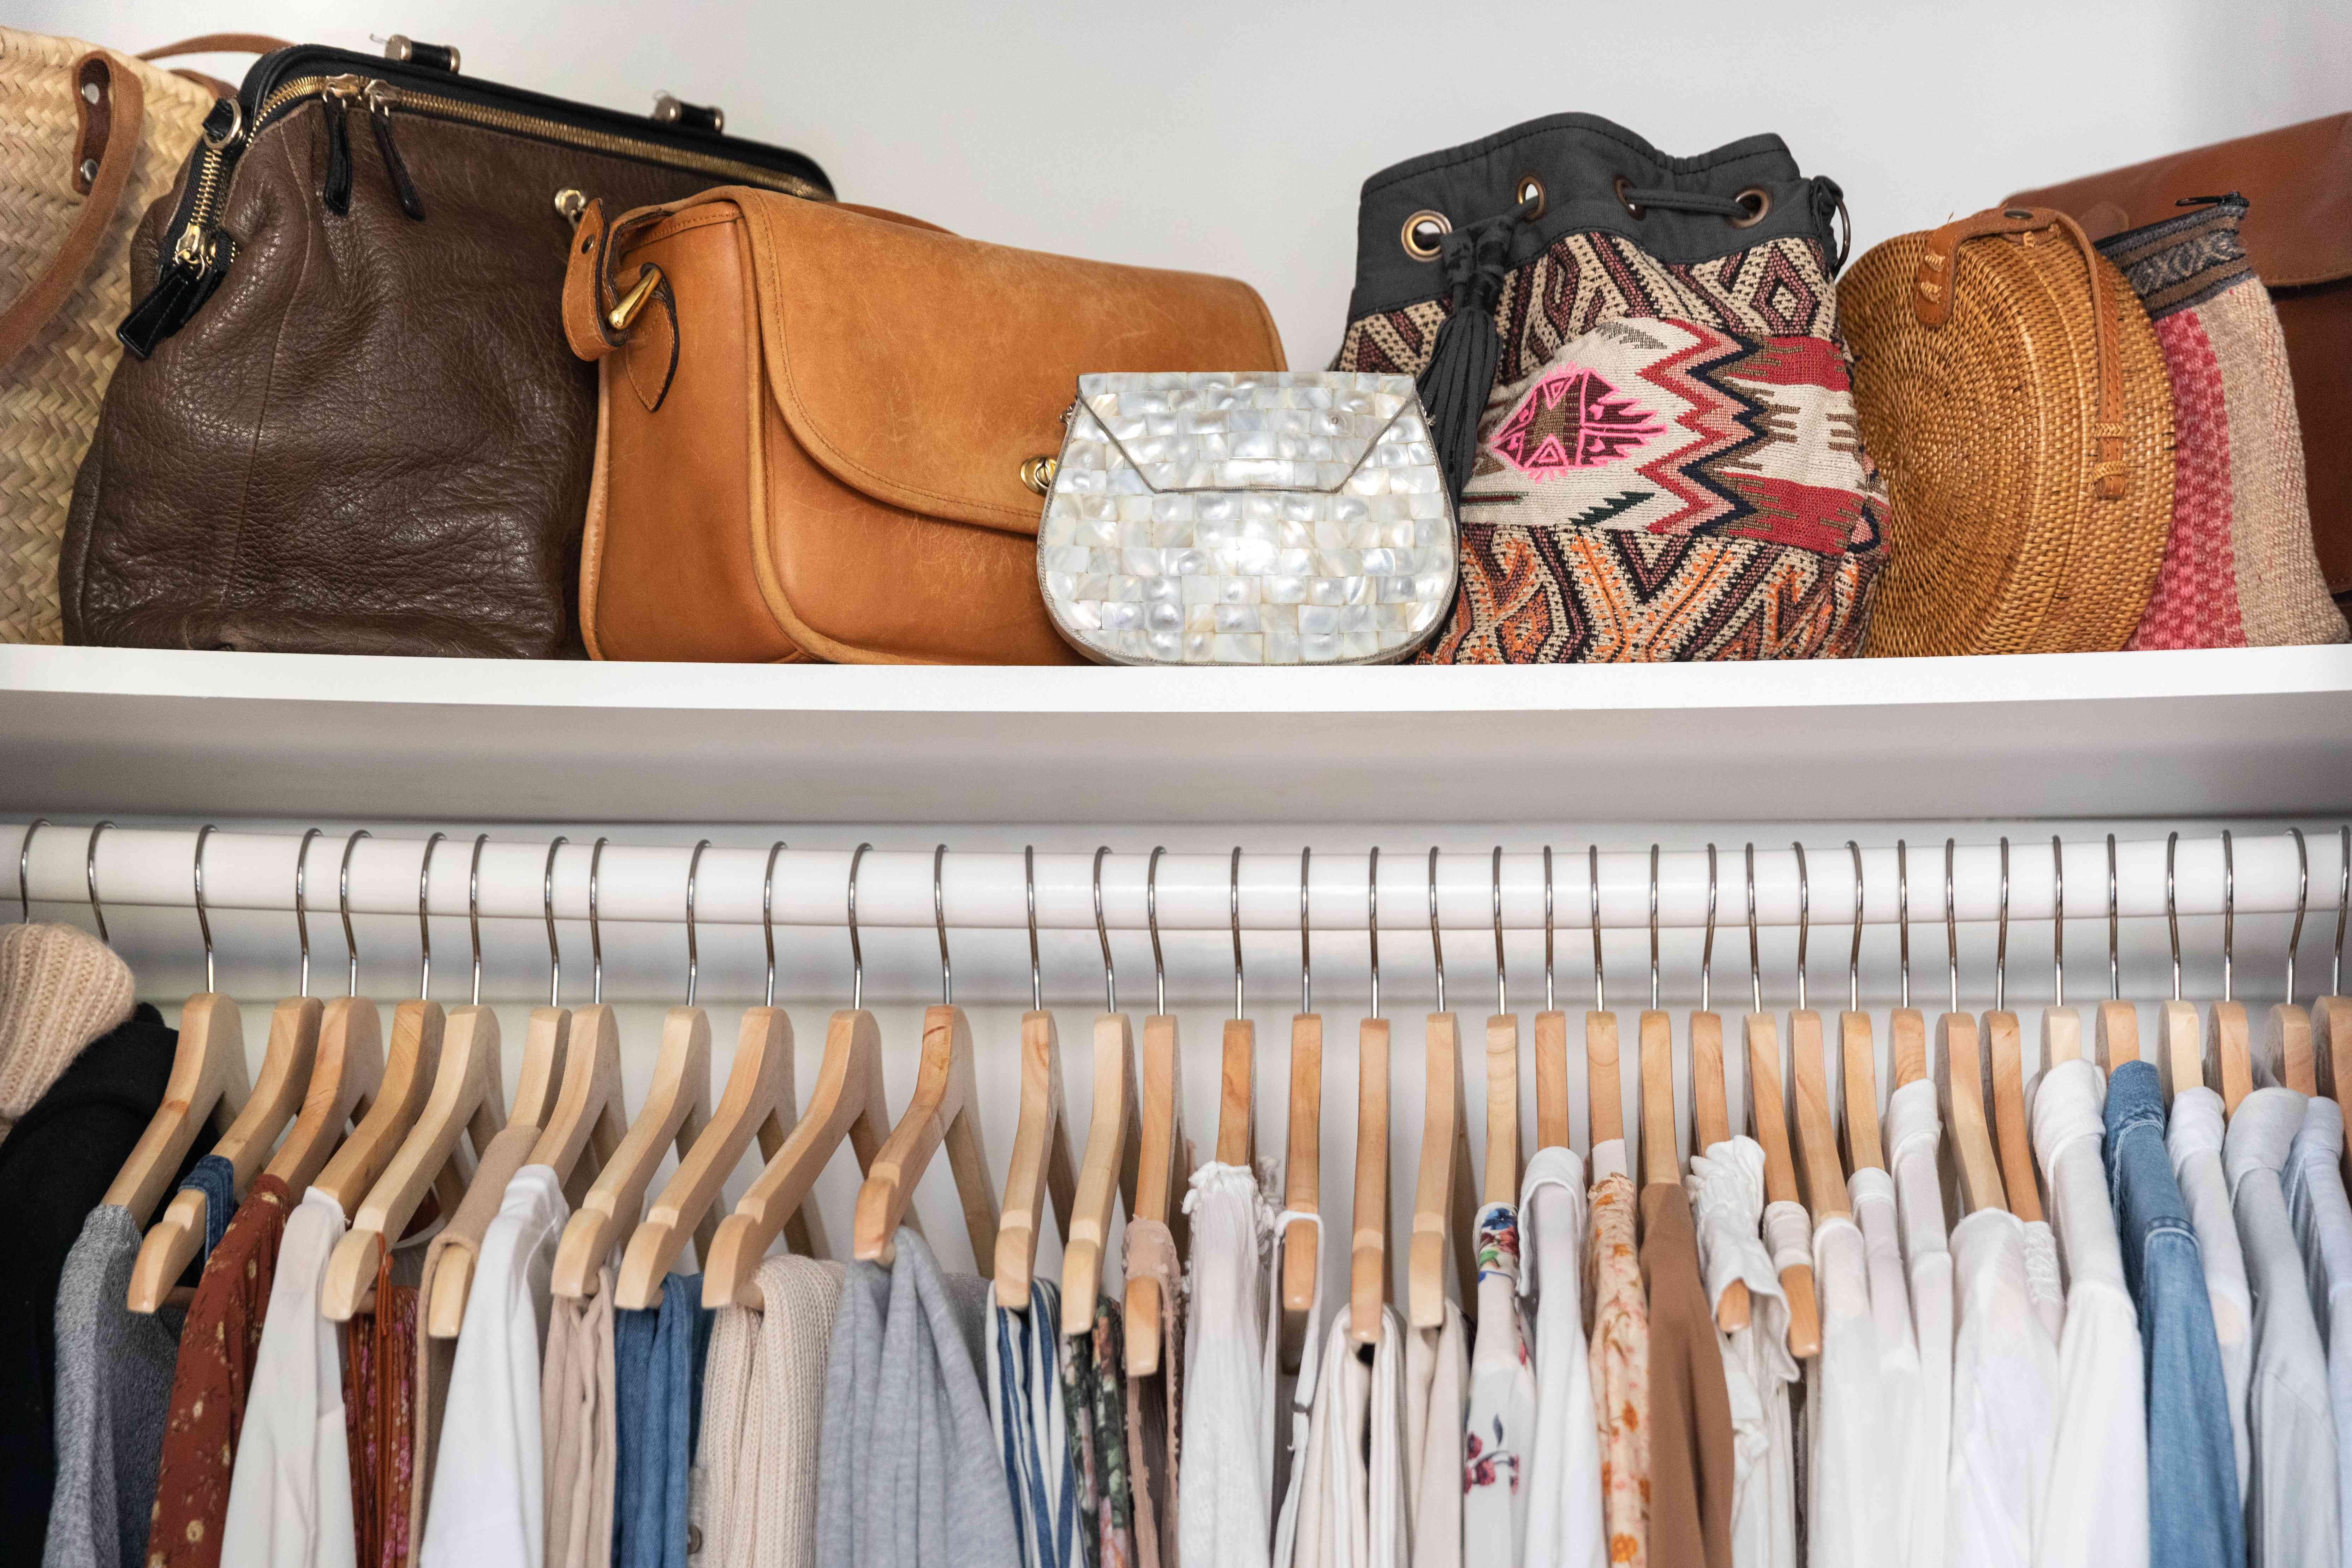 handbags stored on a shelf in a closet